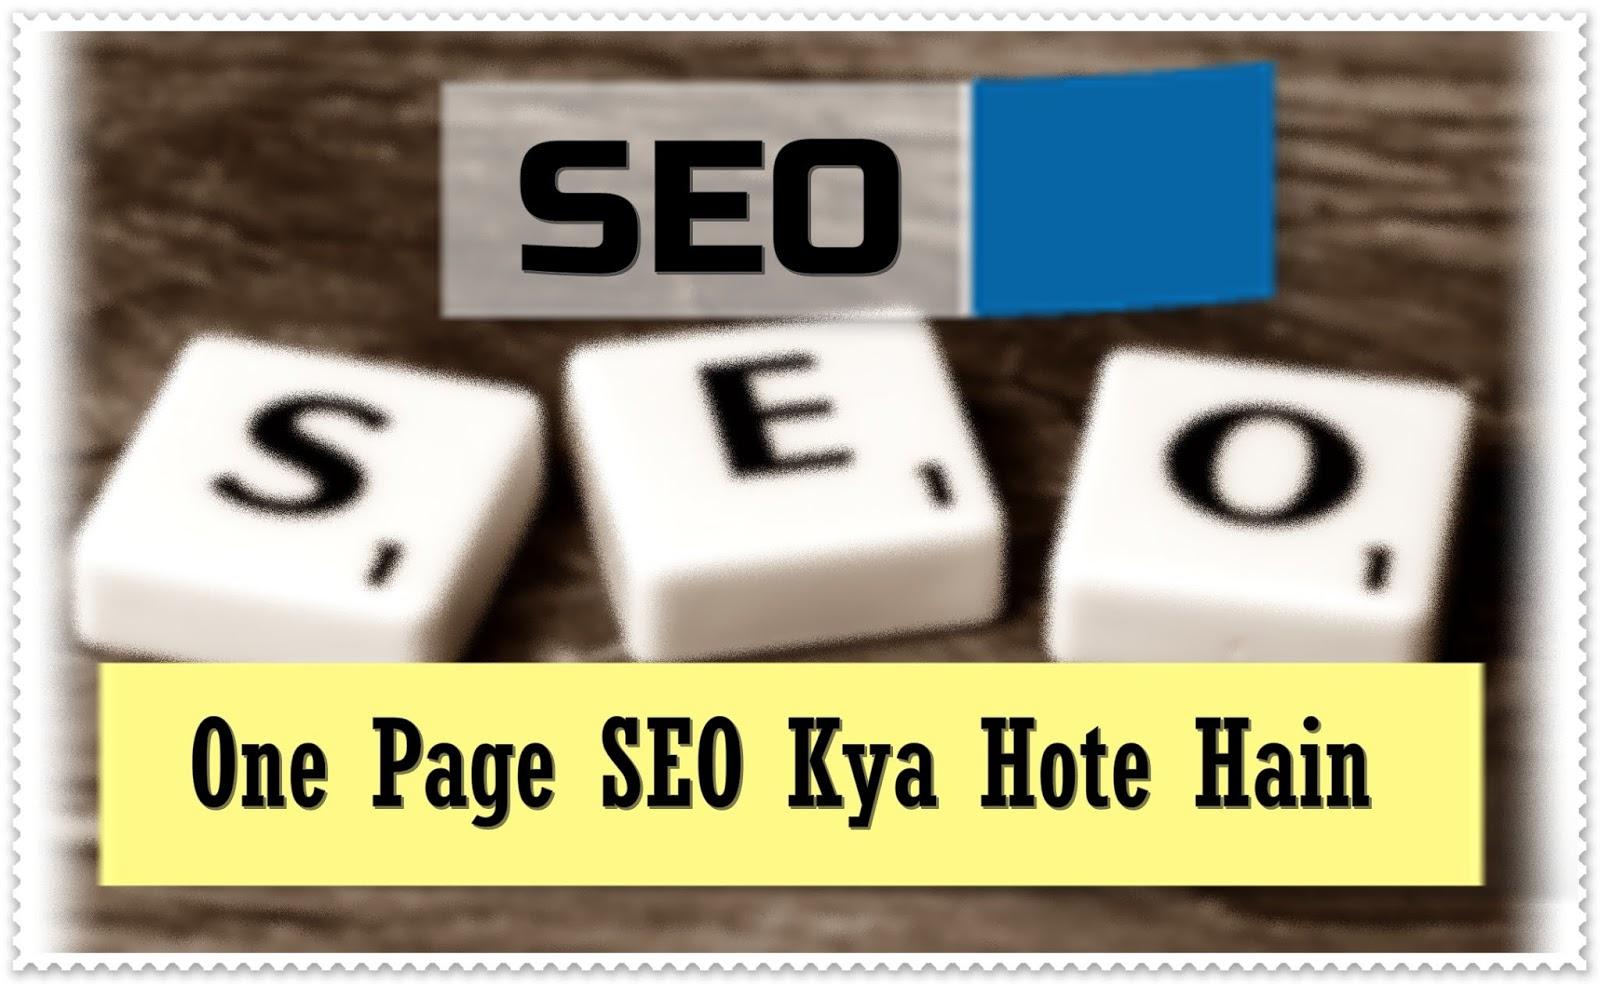 One PAGE Seo Kya Hote Hain